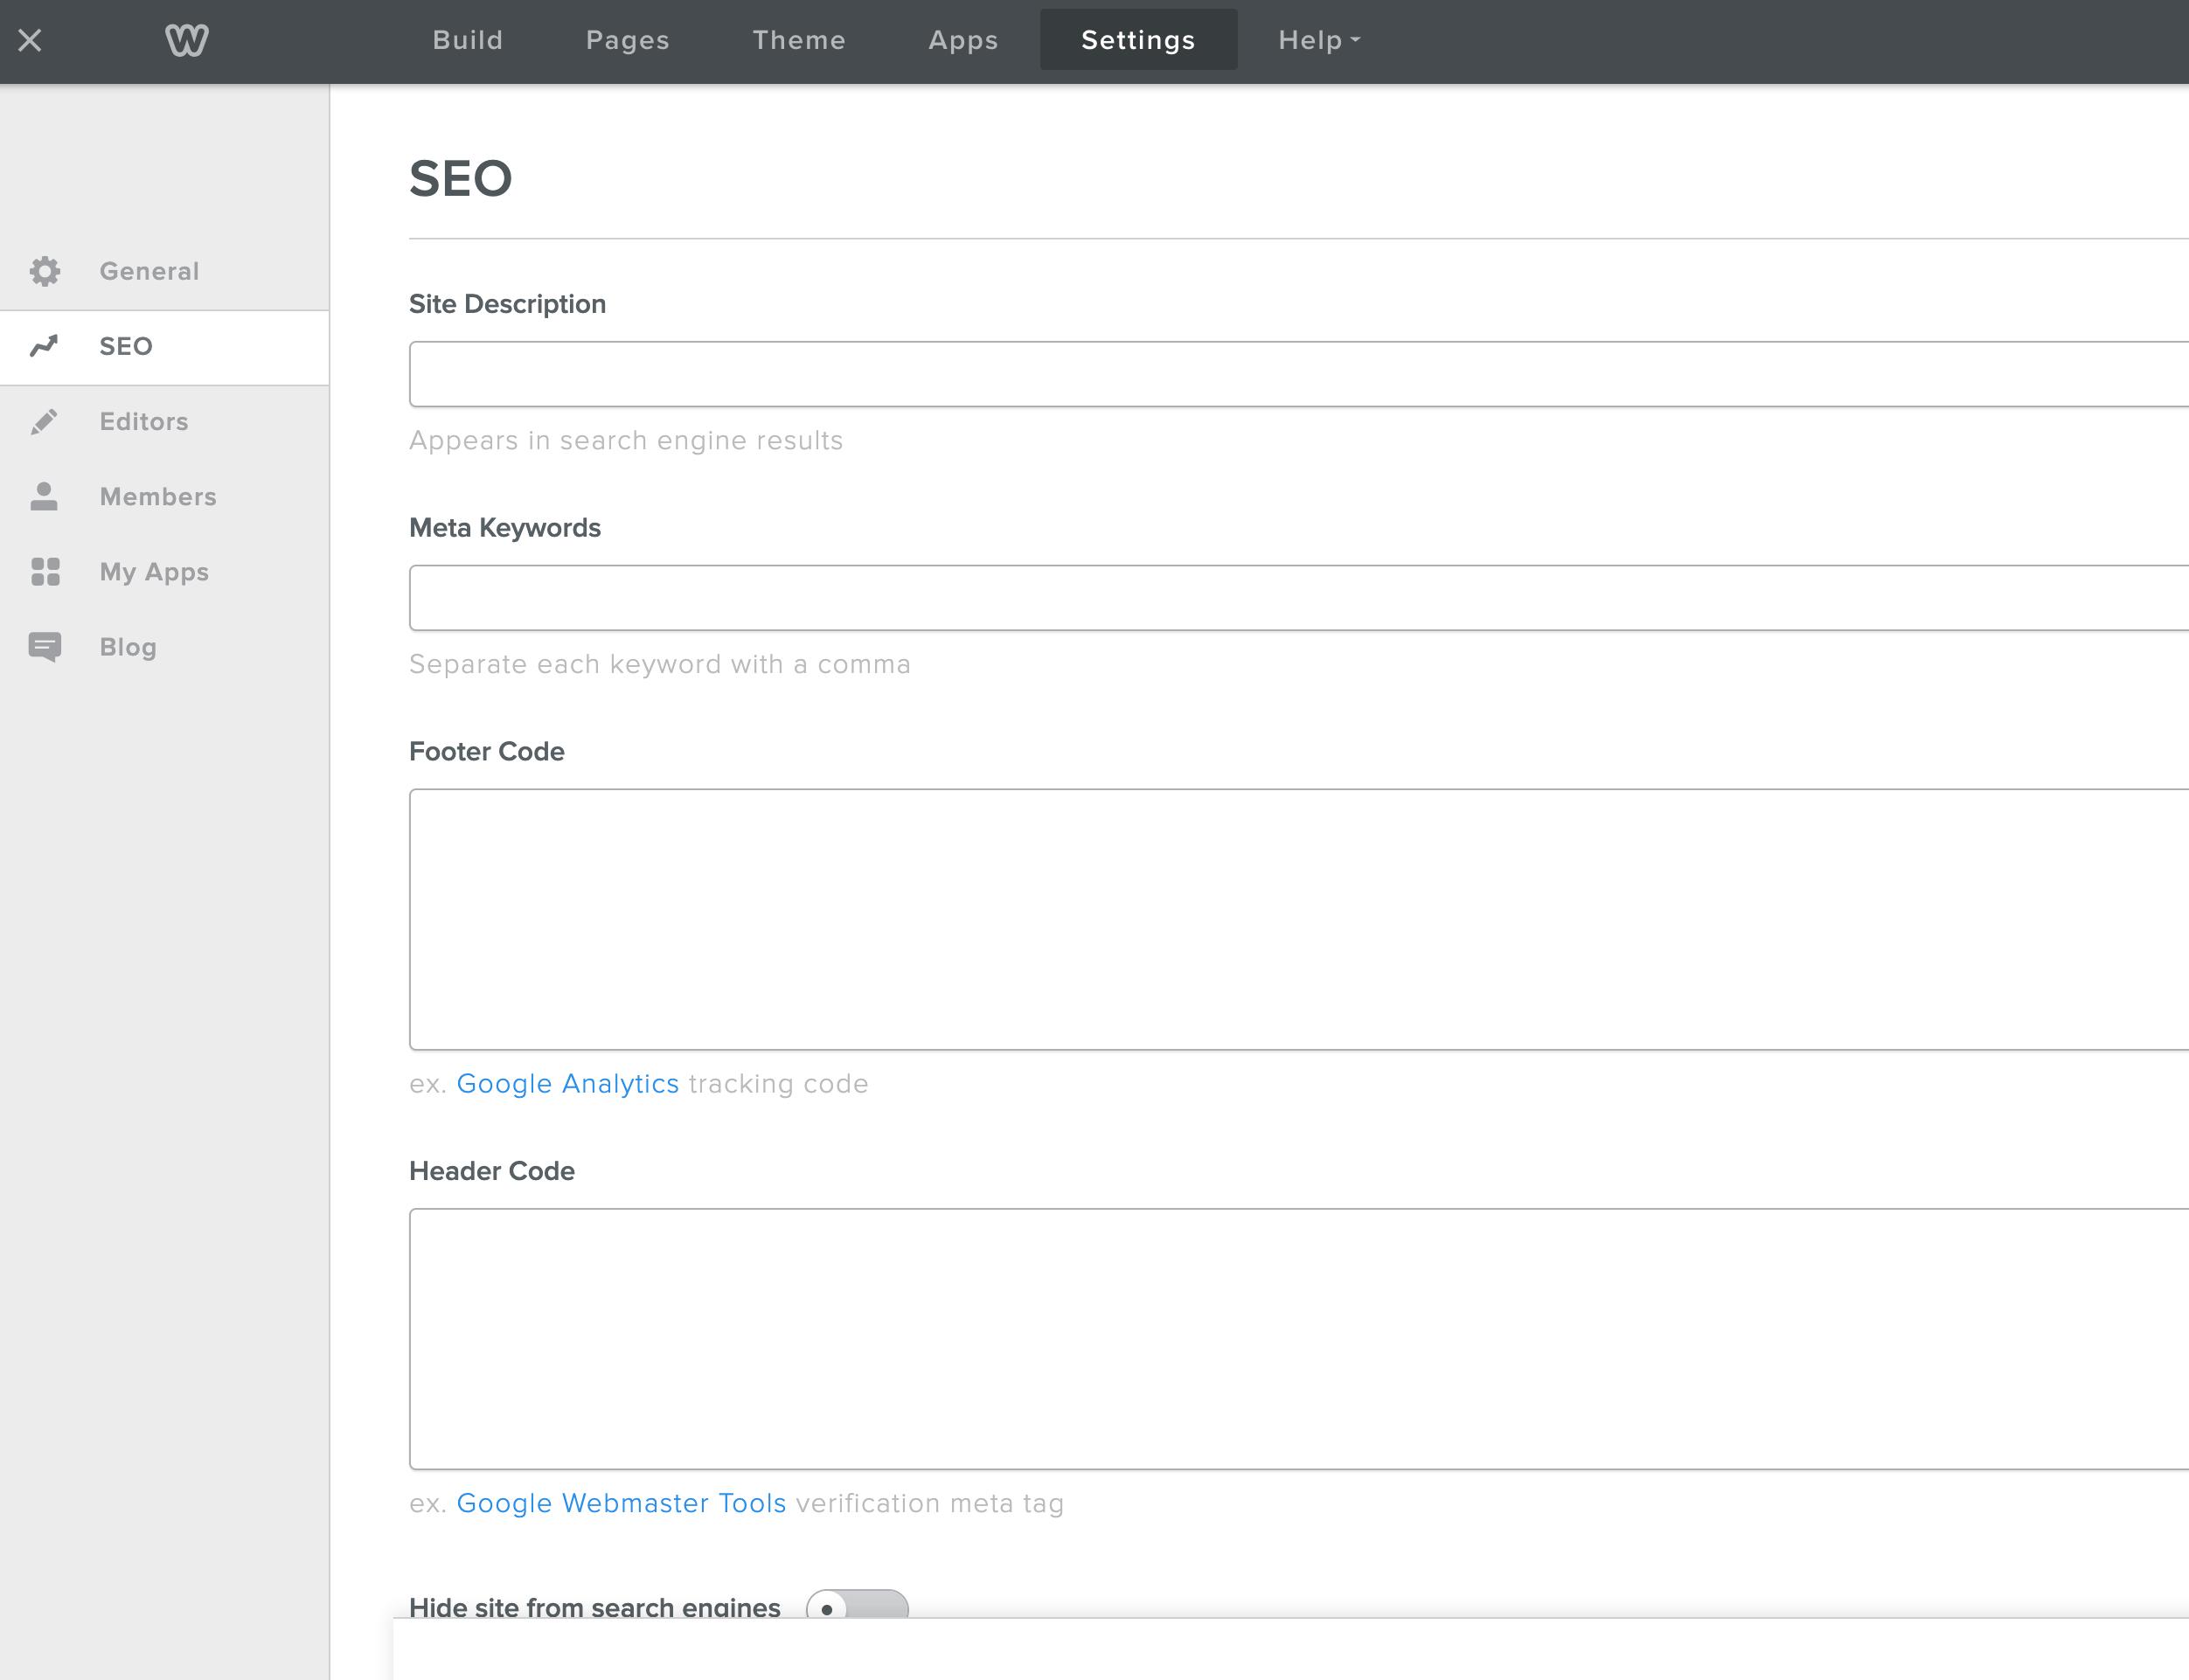 Weebly网站设置SEO选项